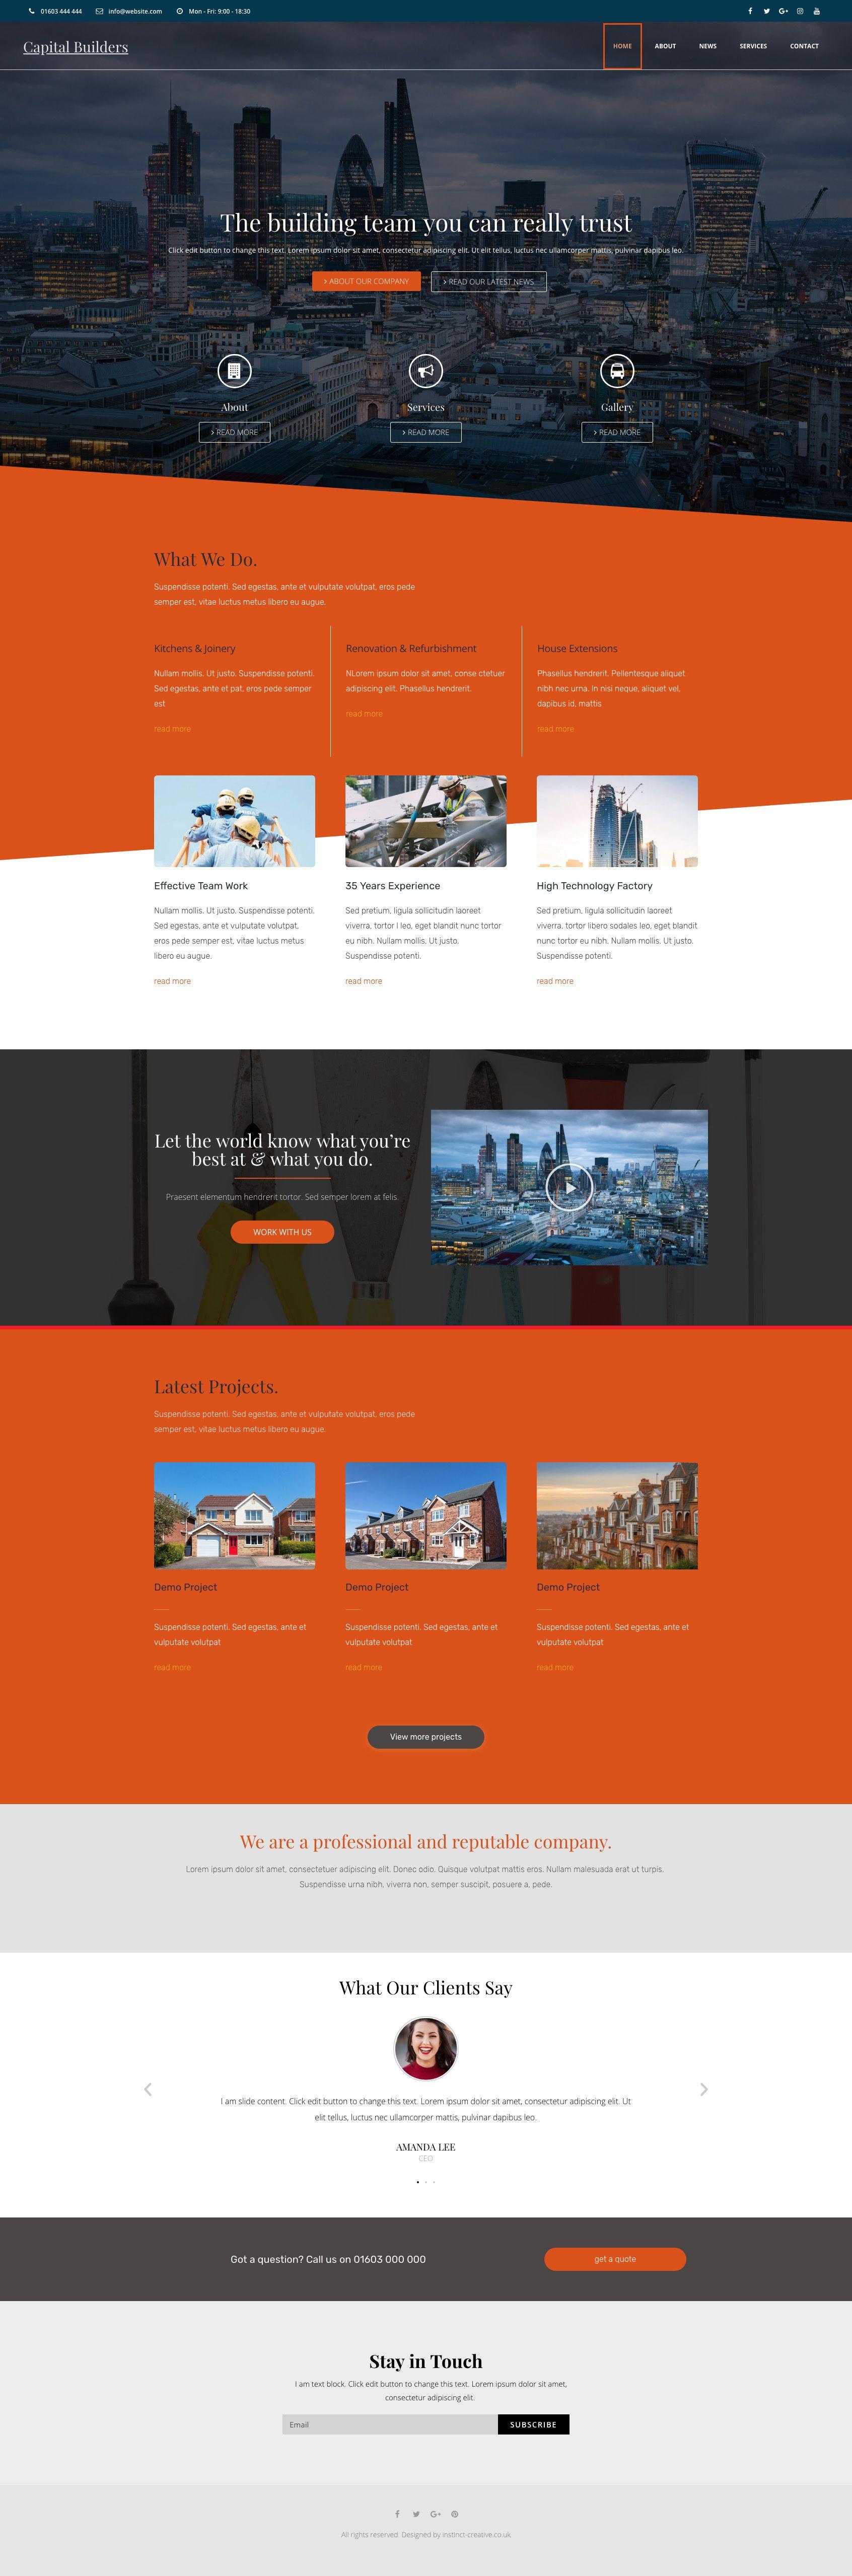 Web And App Design For A Building Company Made In Wordpress Bespoke Design Web App Design Best Web Design Web Design